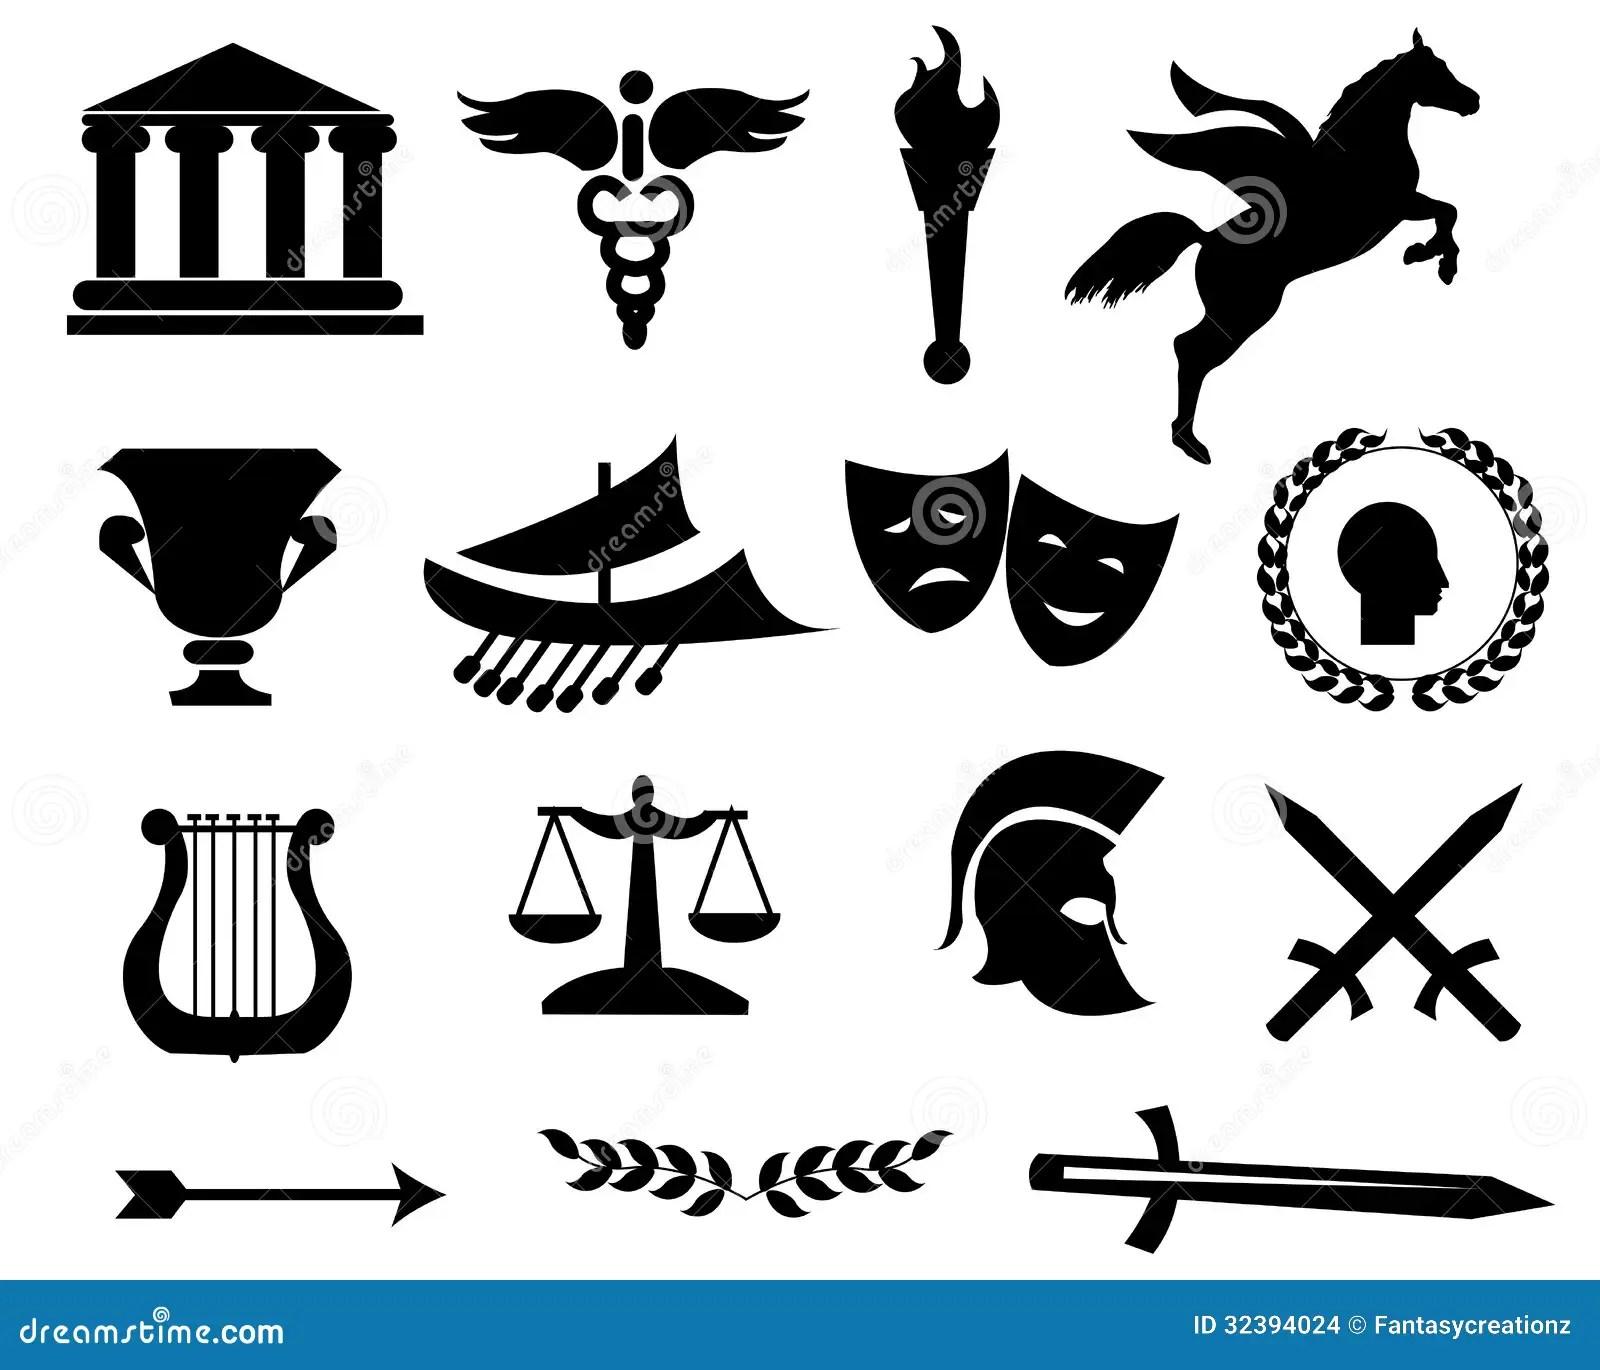 Icones Do Preto De Grecia Ilustracao Do Vetor Ilustracao